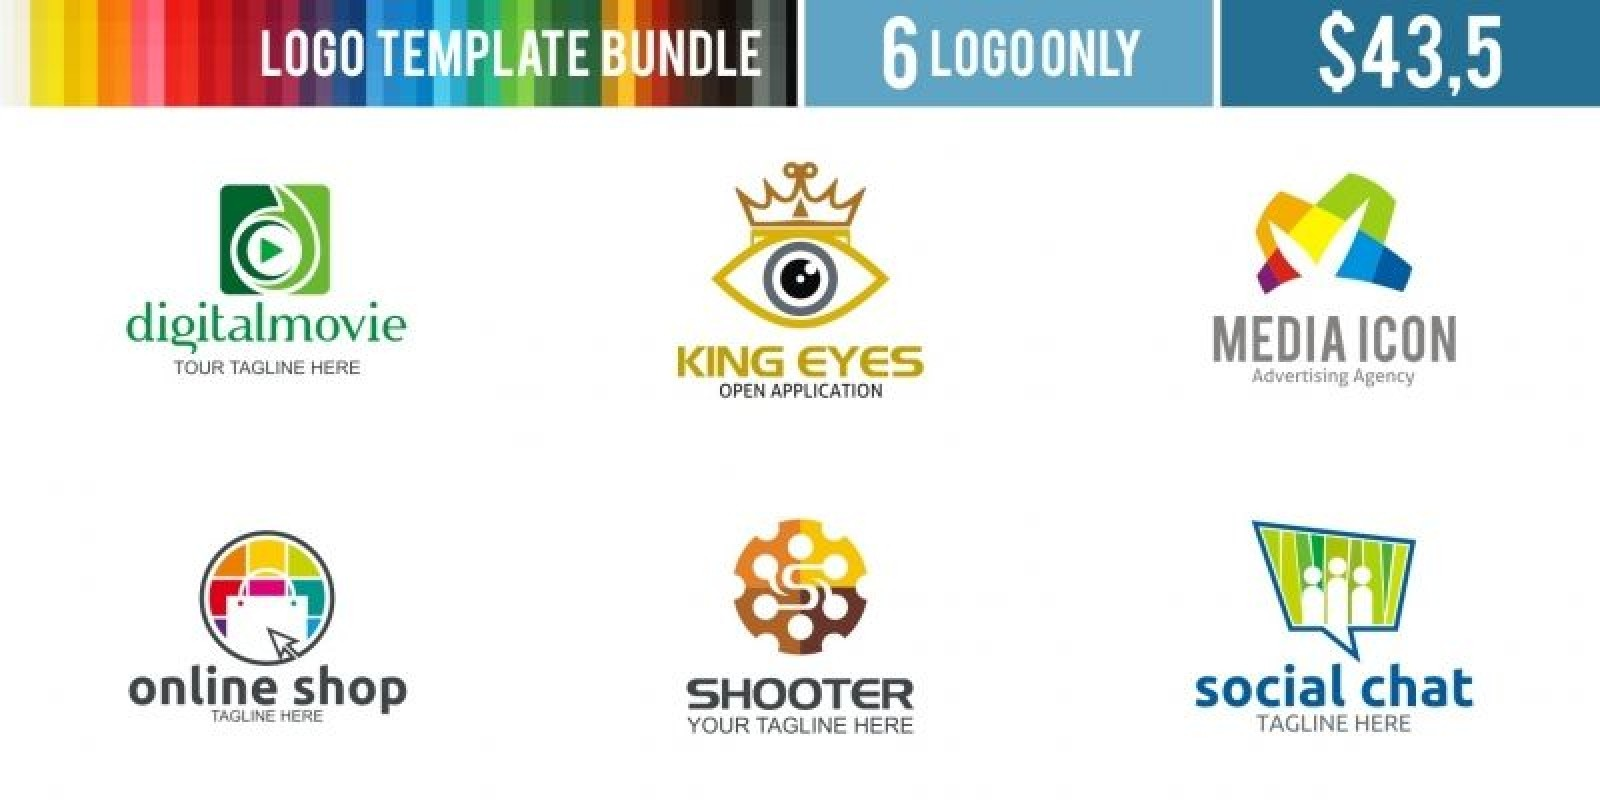 Logo Templates Bundle #4